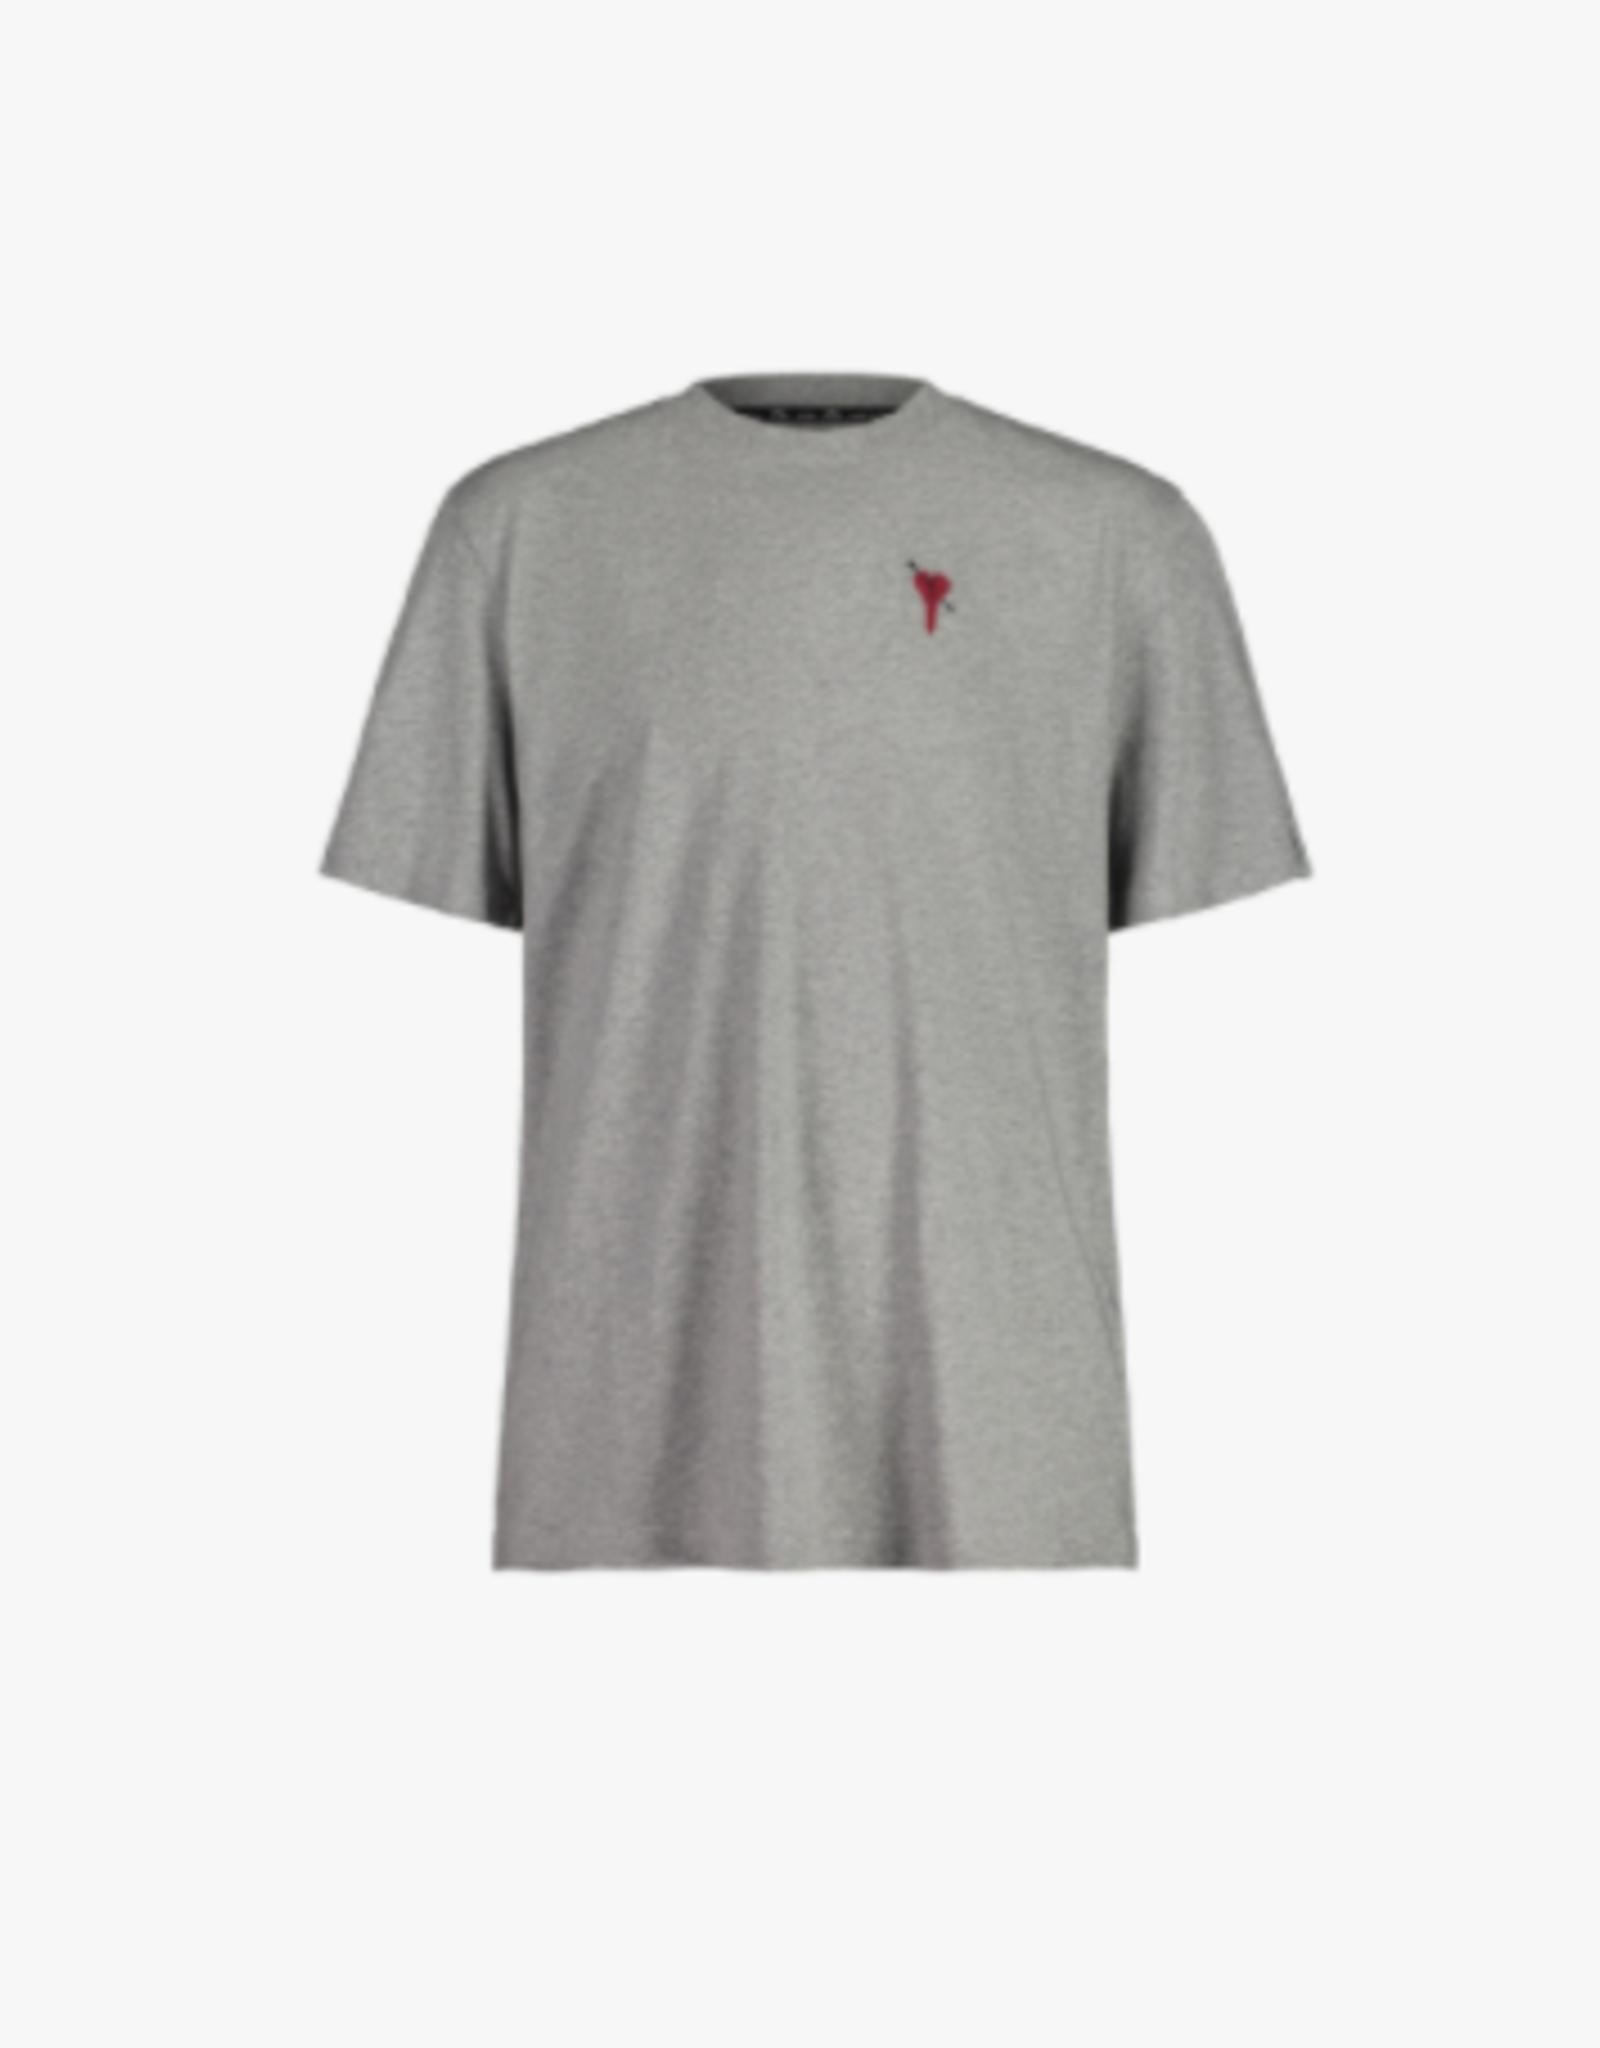 maloja Trauermantel T-shirt